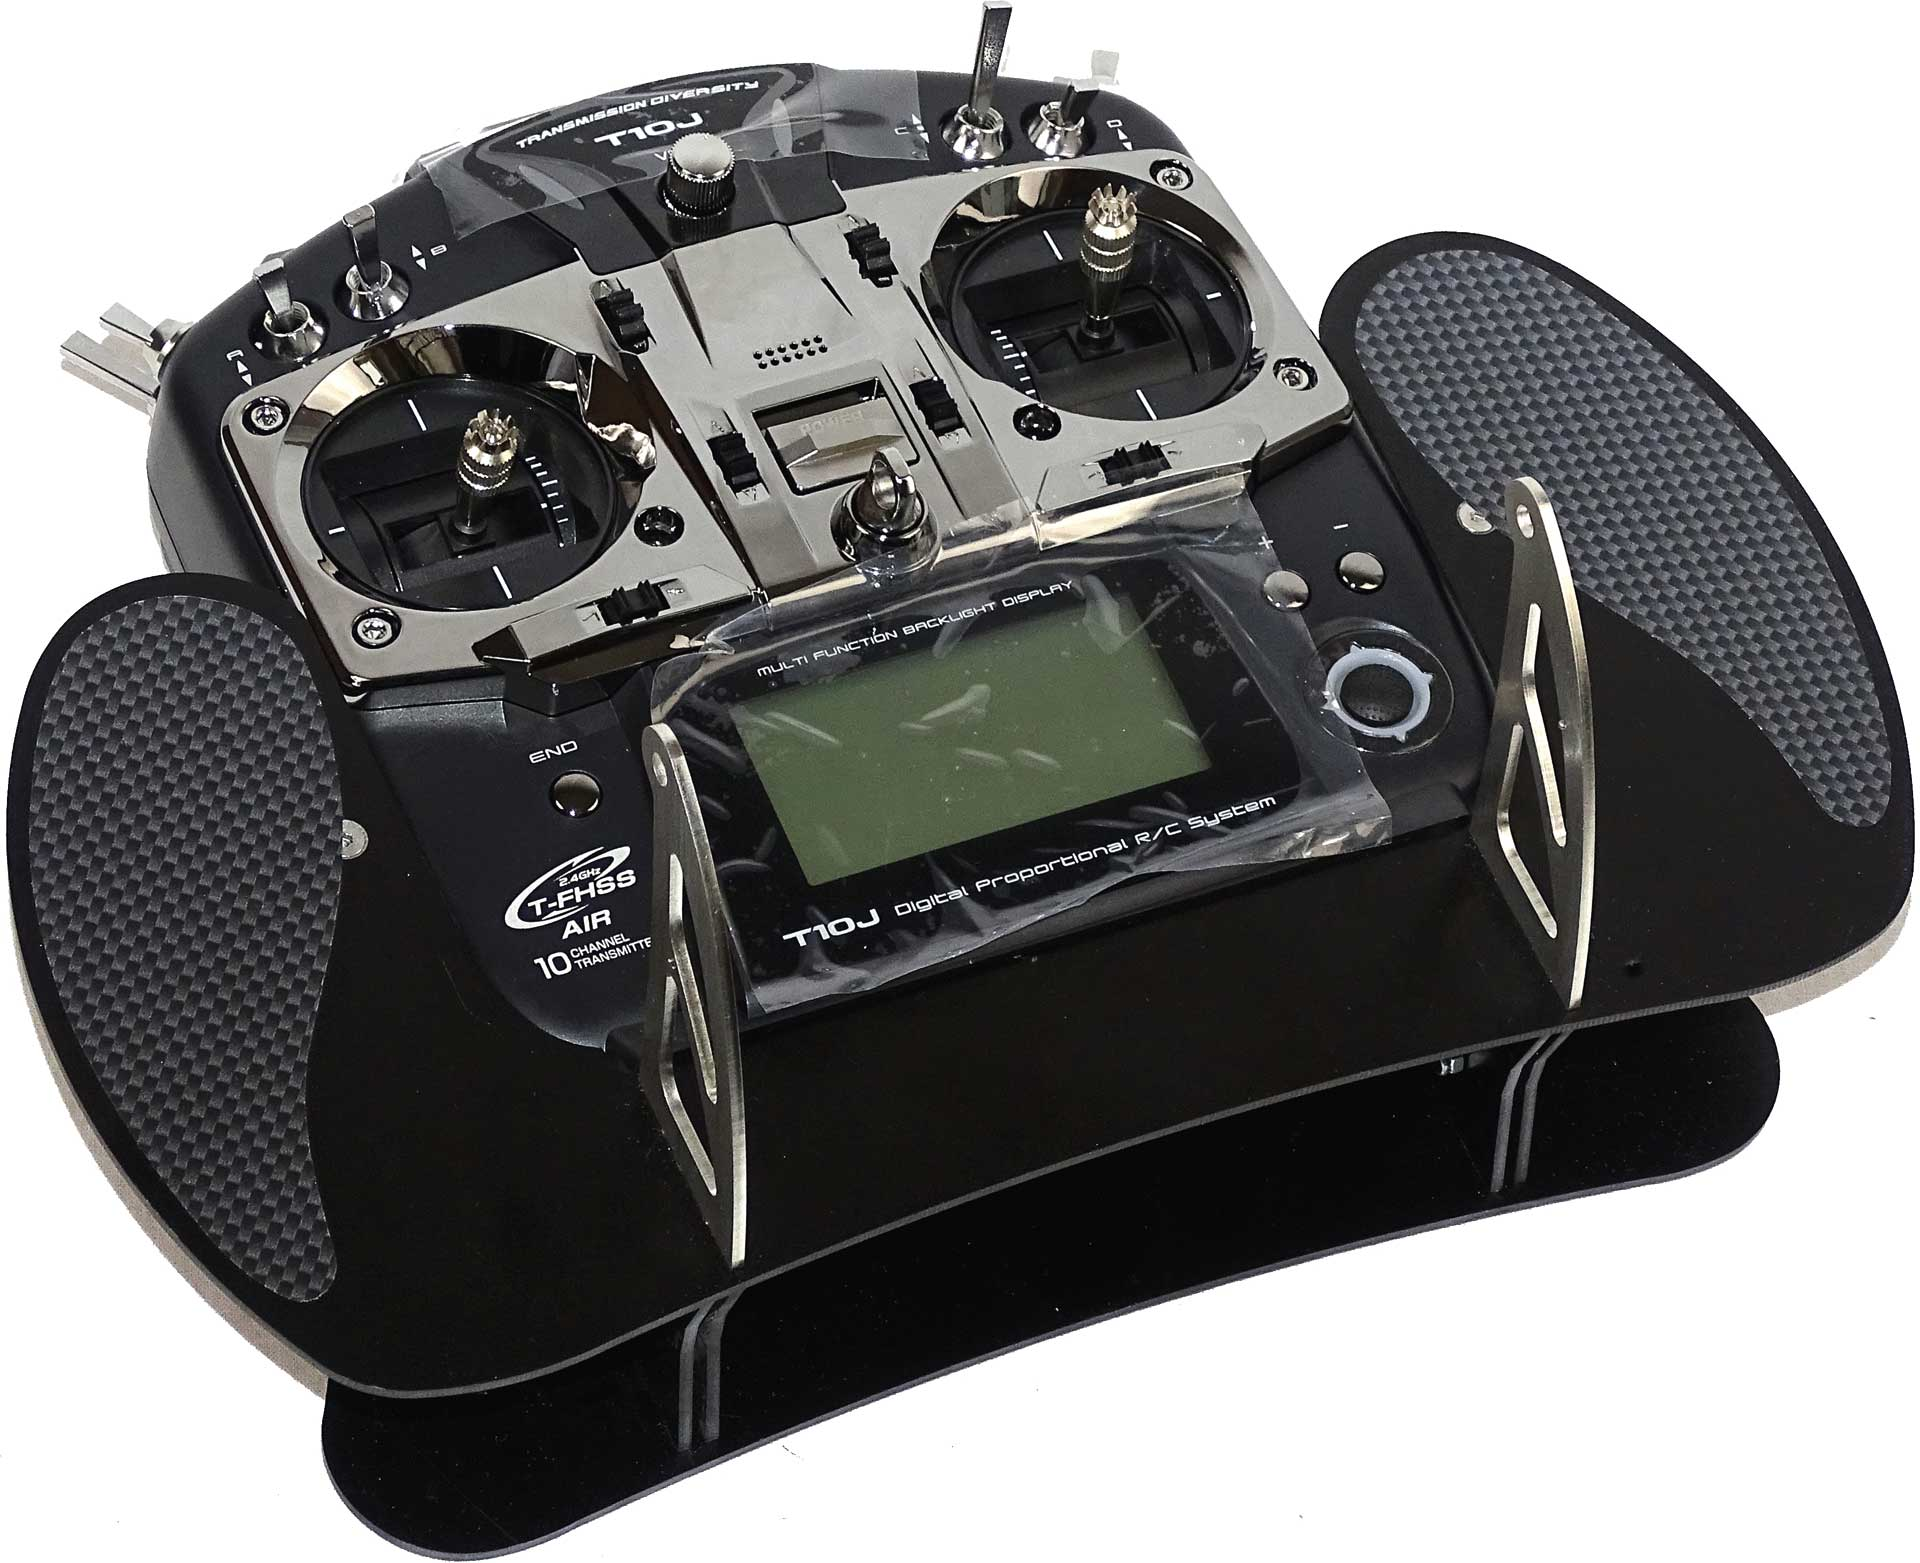 AHLTEC Senderpult Futaba T10J Black mit Standard Senderpultbügel, ohne Handauflagen